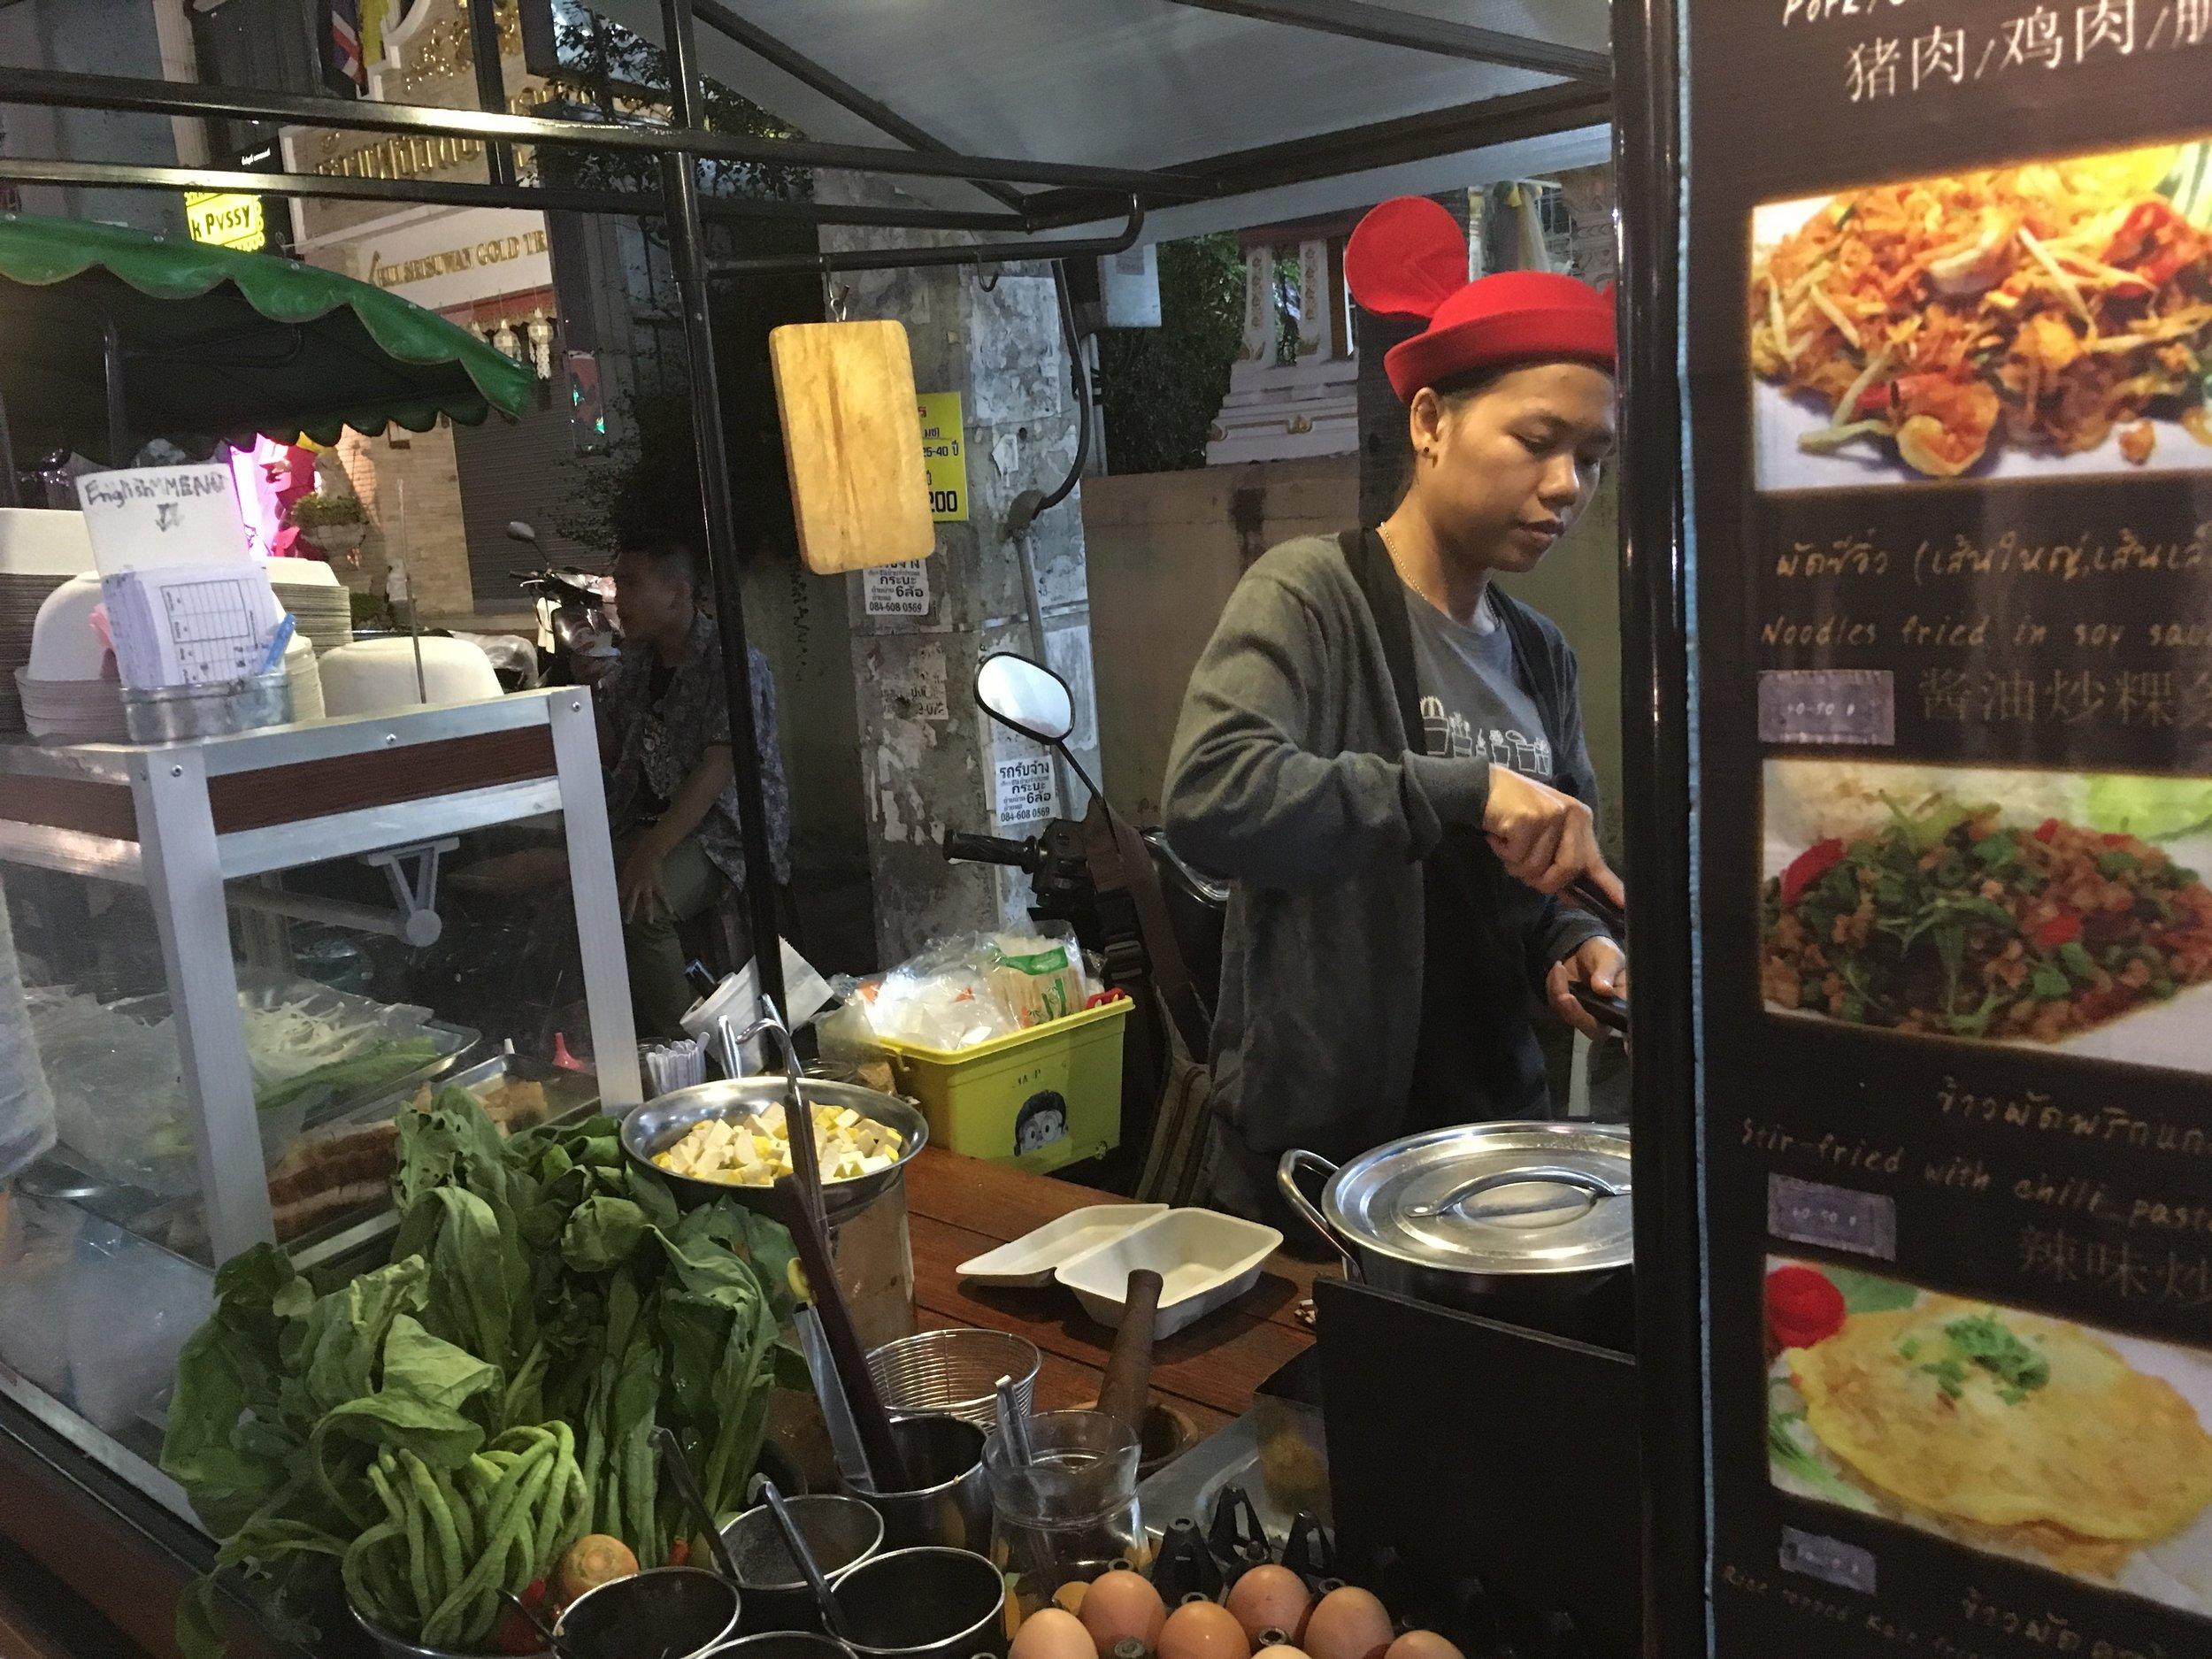 A street food chef